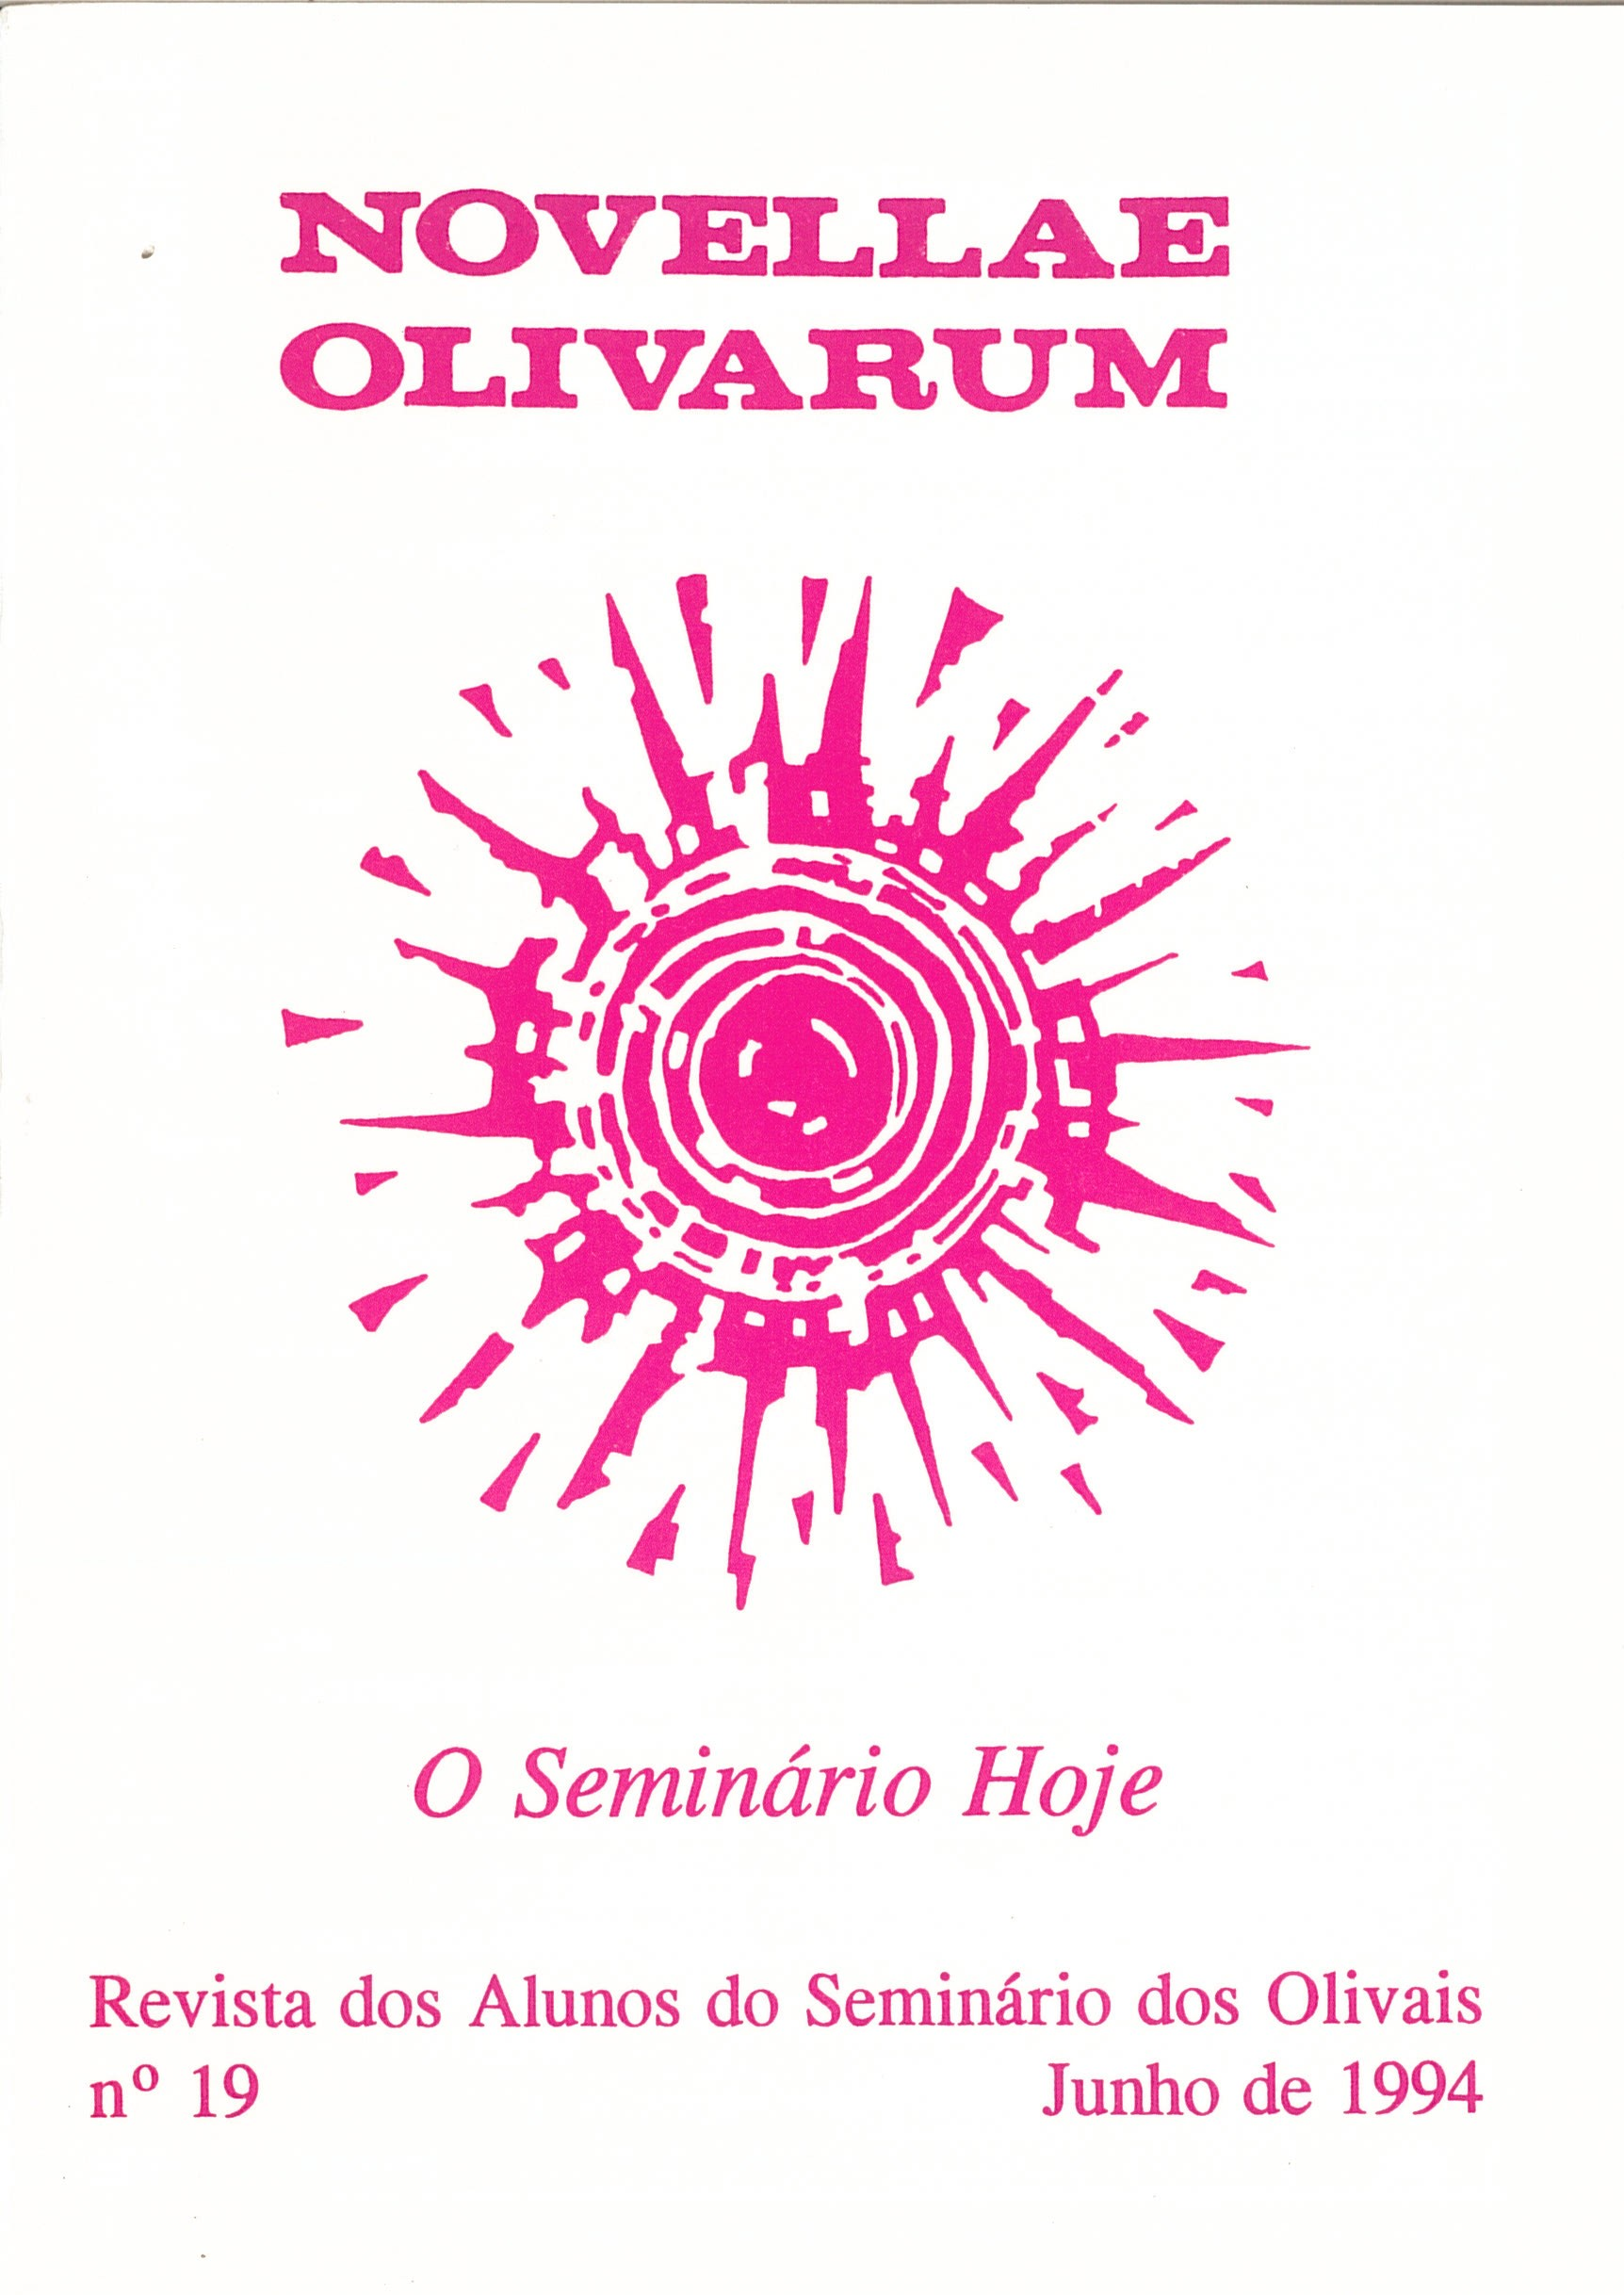 Revista Novellae Olivarum, nº 19 - Junho de 1994 (capa)